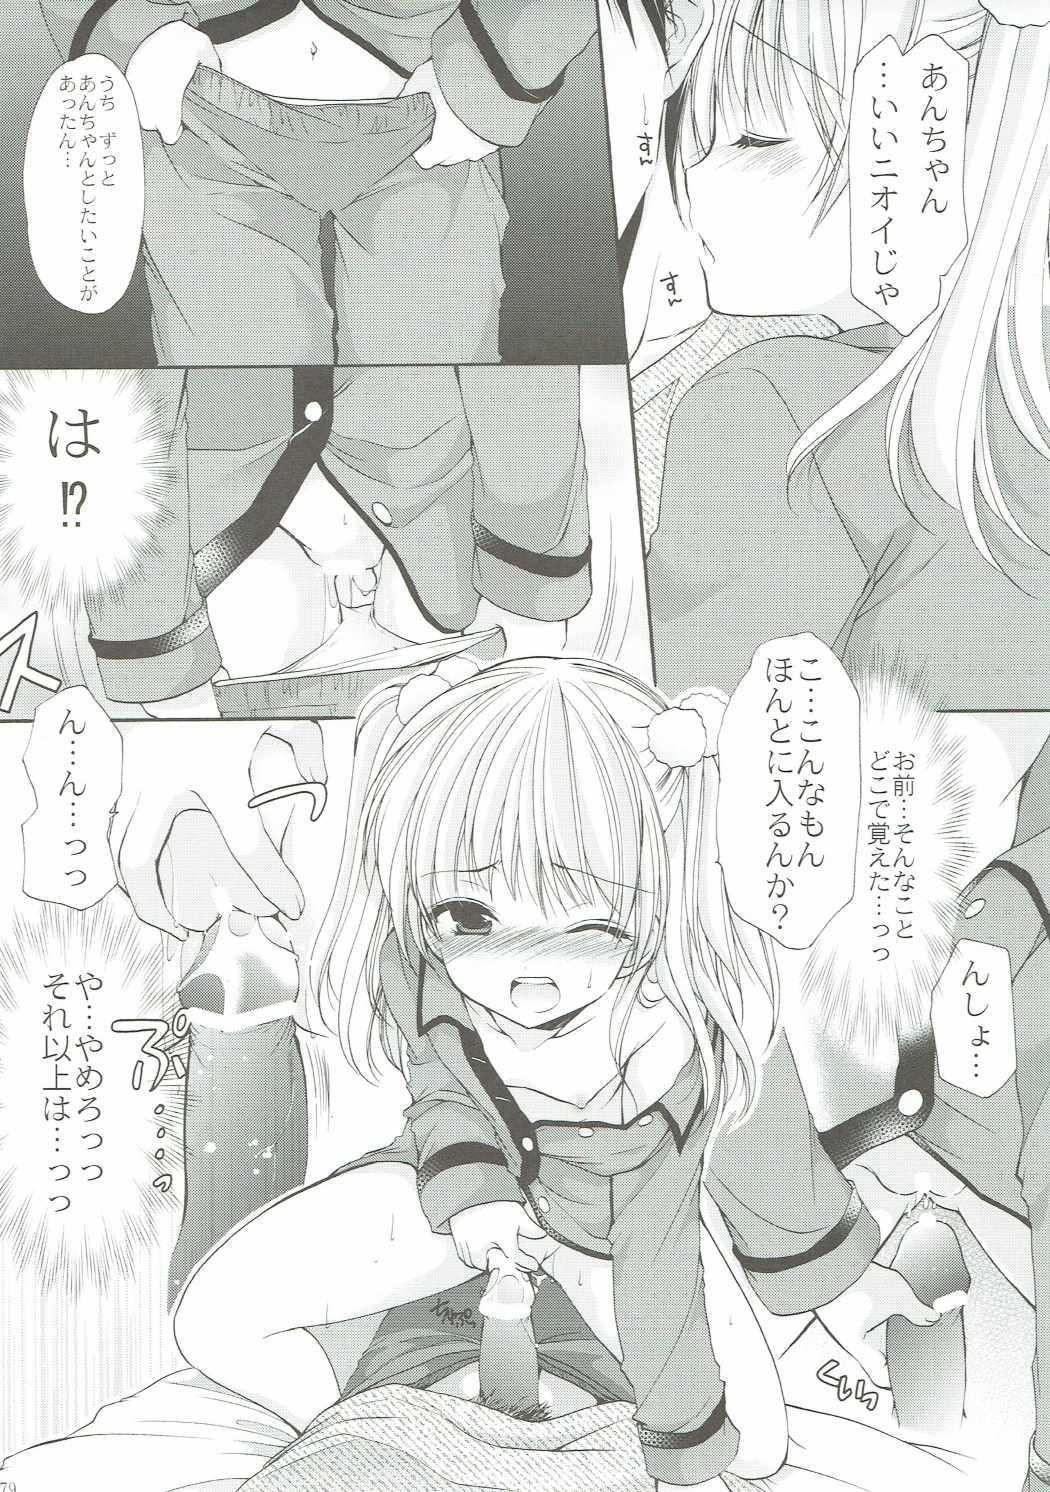 ANIME COLLECTION Imomuya Honpo - Singleton Anime Soushuuhen 77